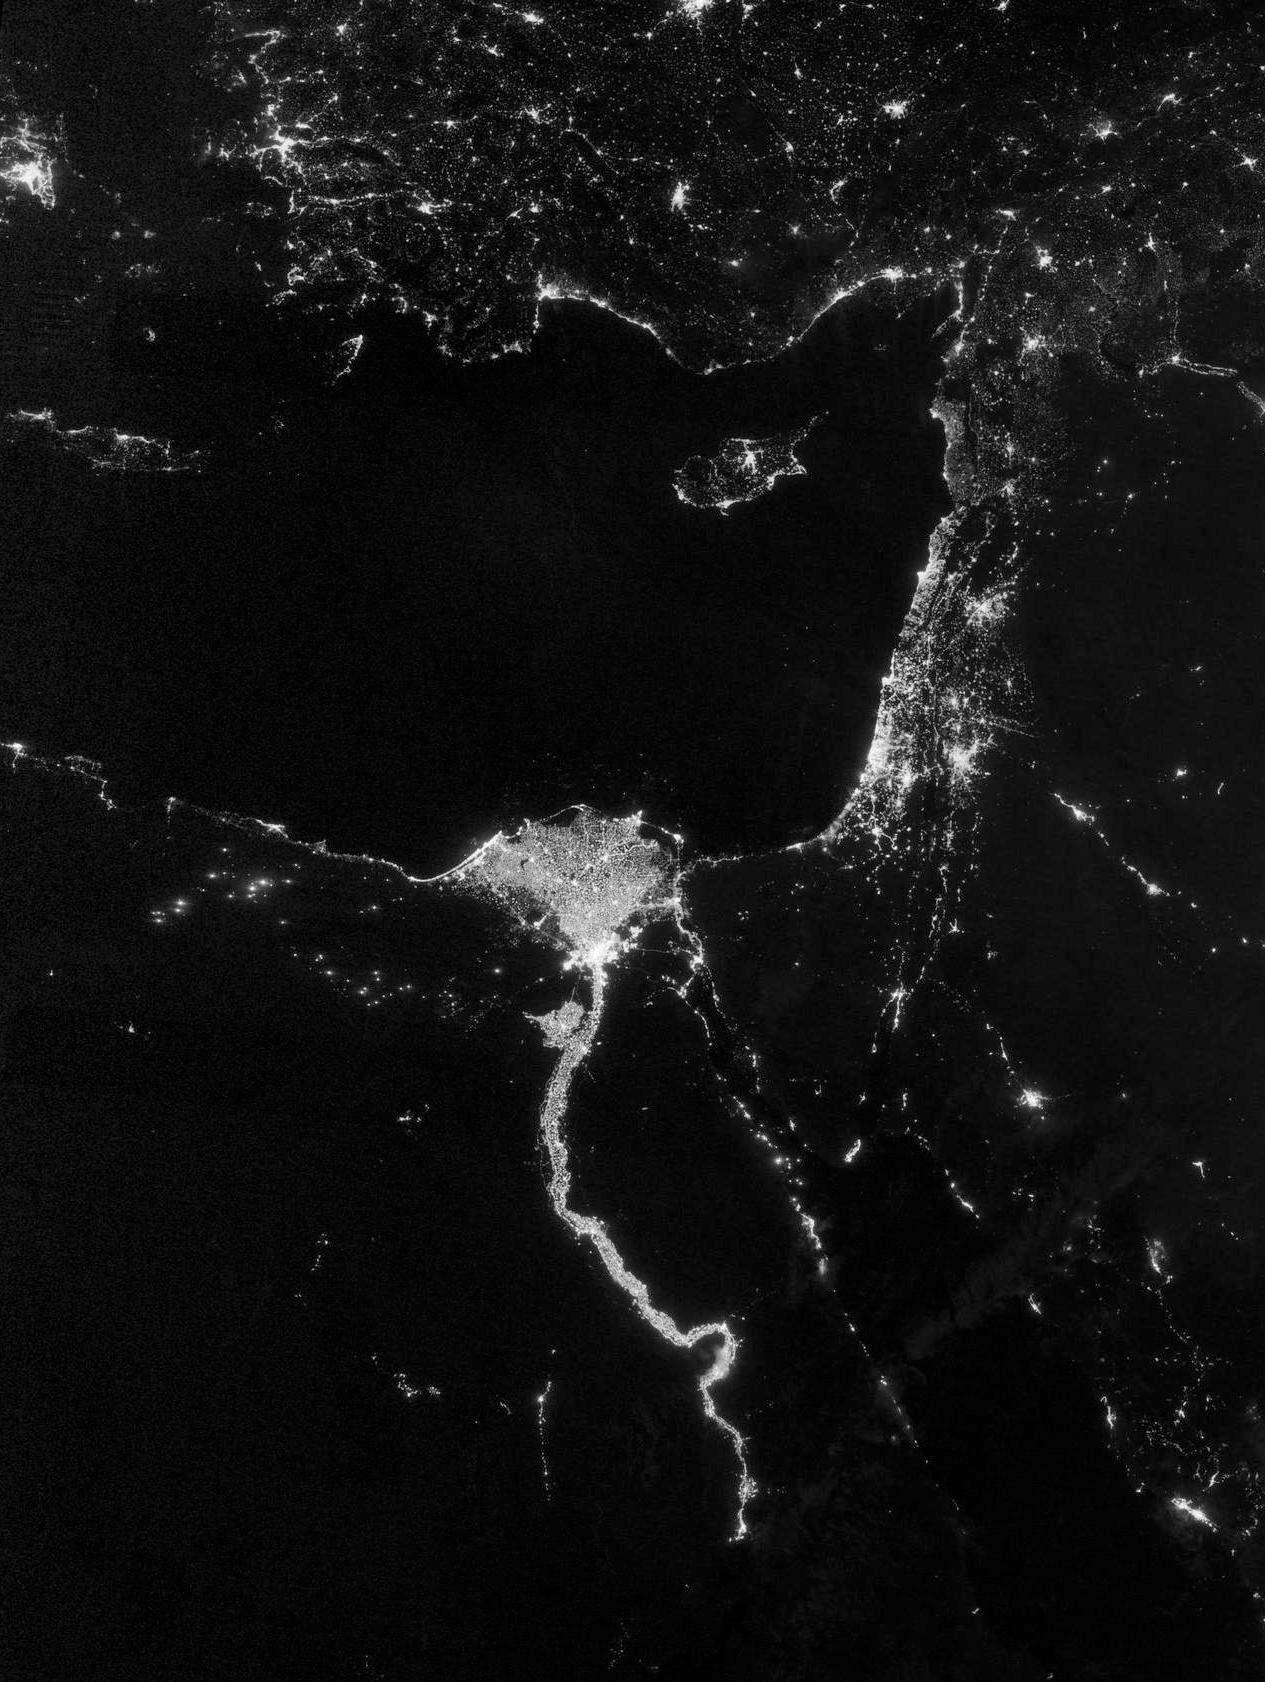 Night lights illuminate the region around the River Nile.    Source   : NASA Earth Observatory